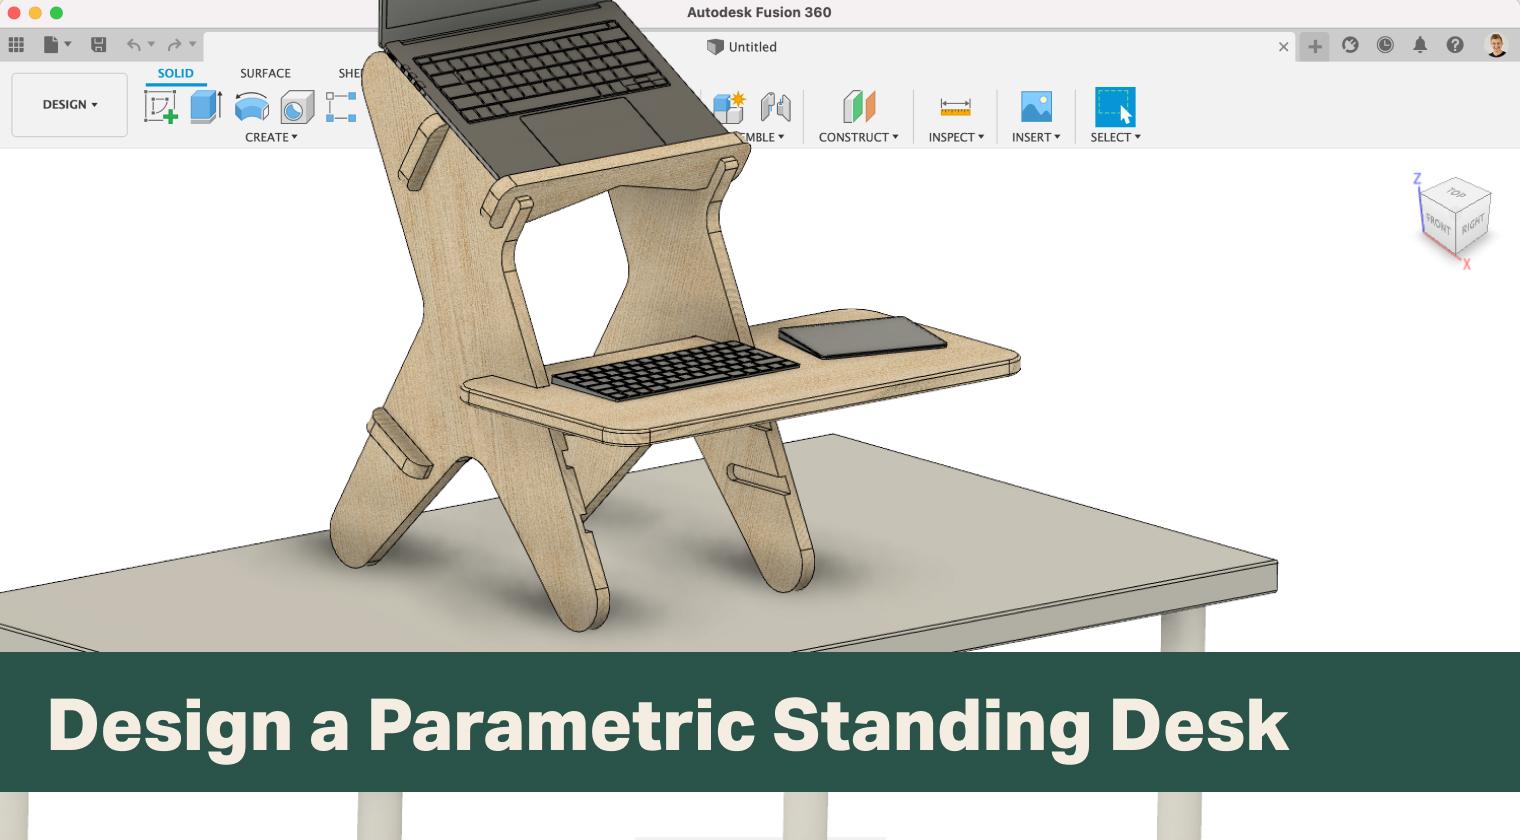 Design a Parametric Standing Desk in Fusion 360